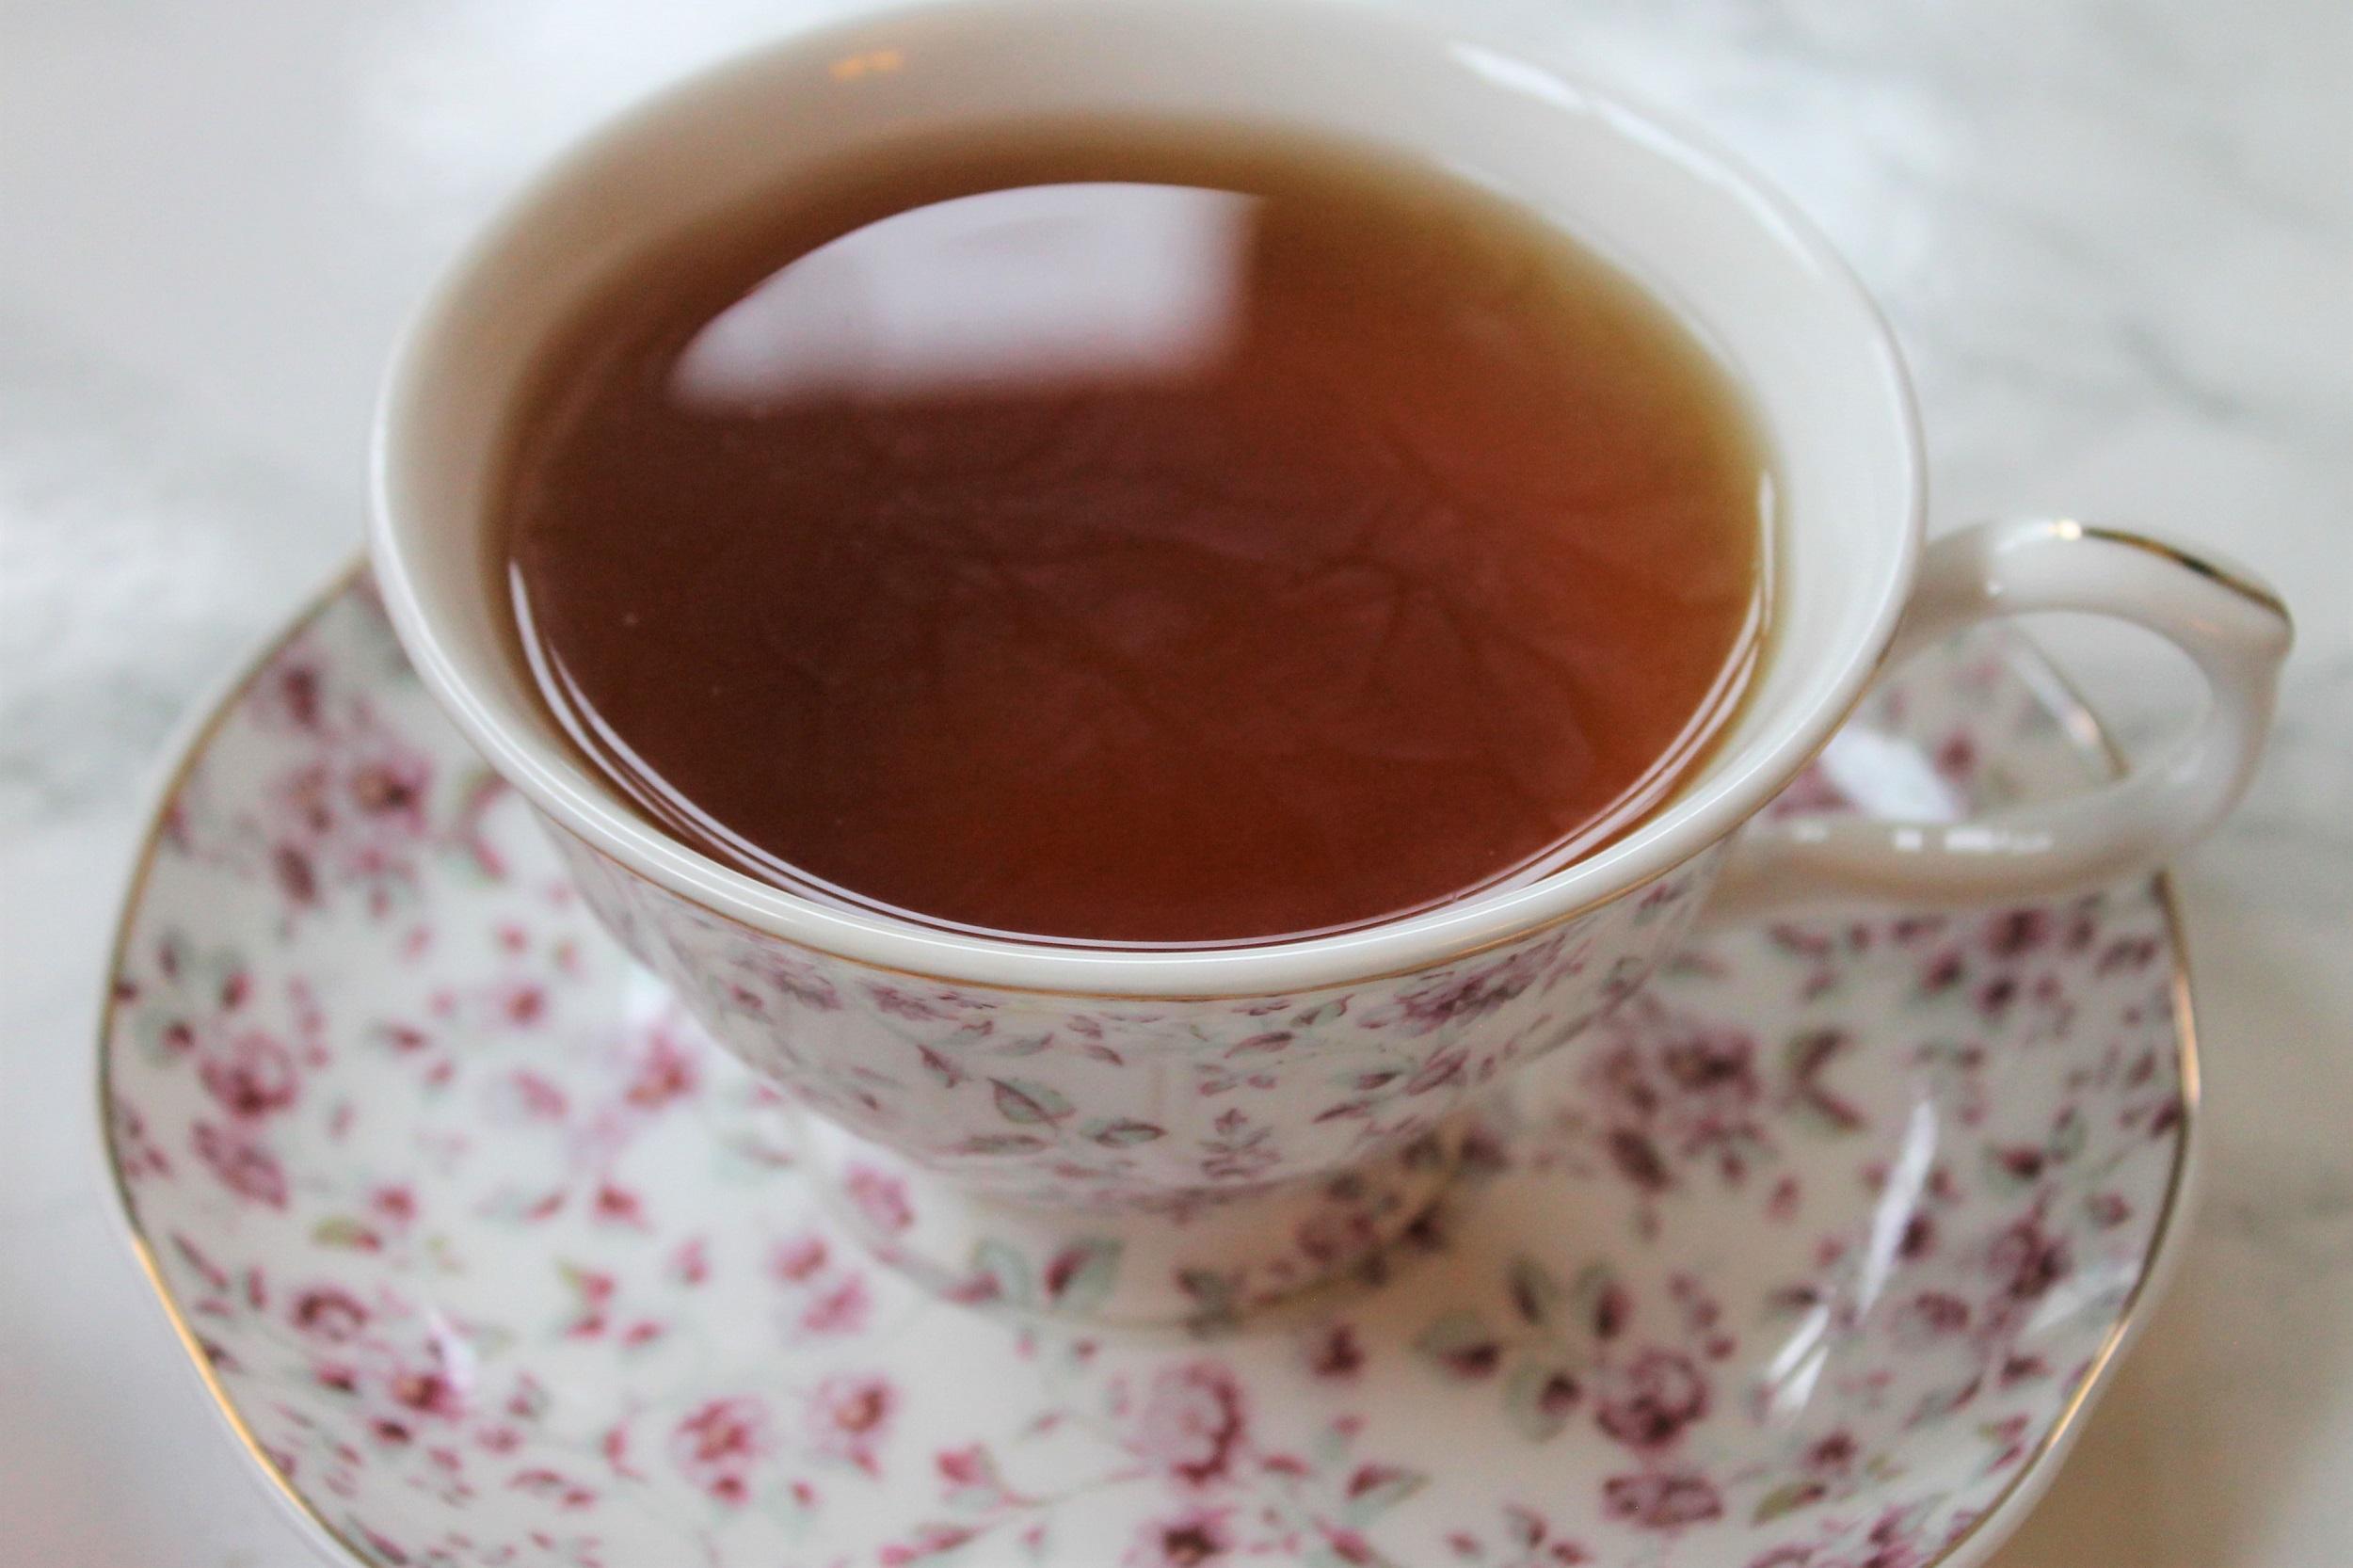 pink ditsy teacup with black tea